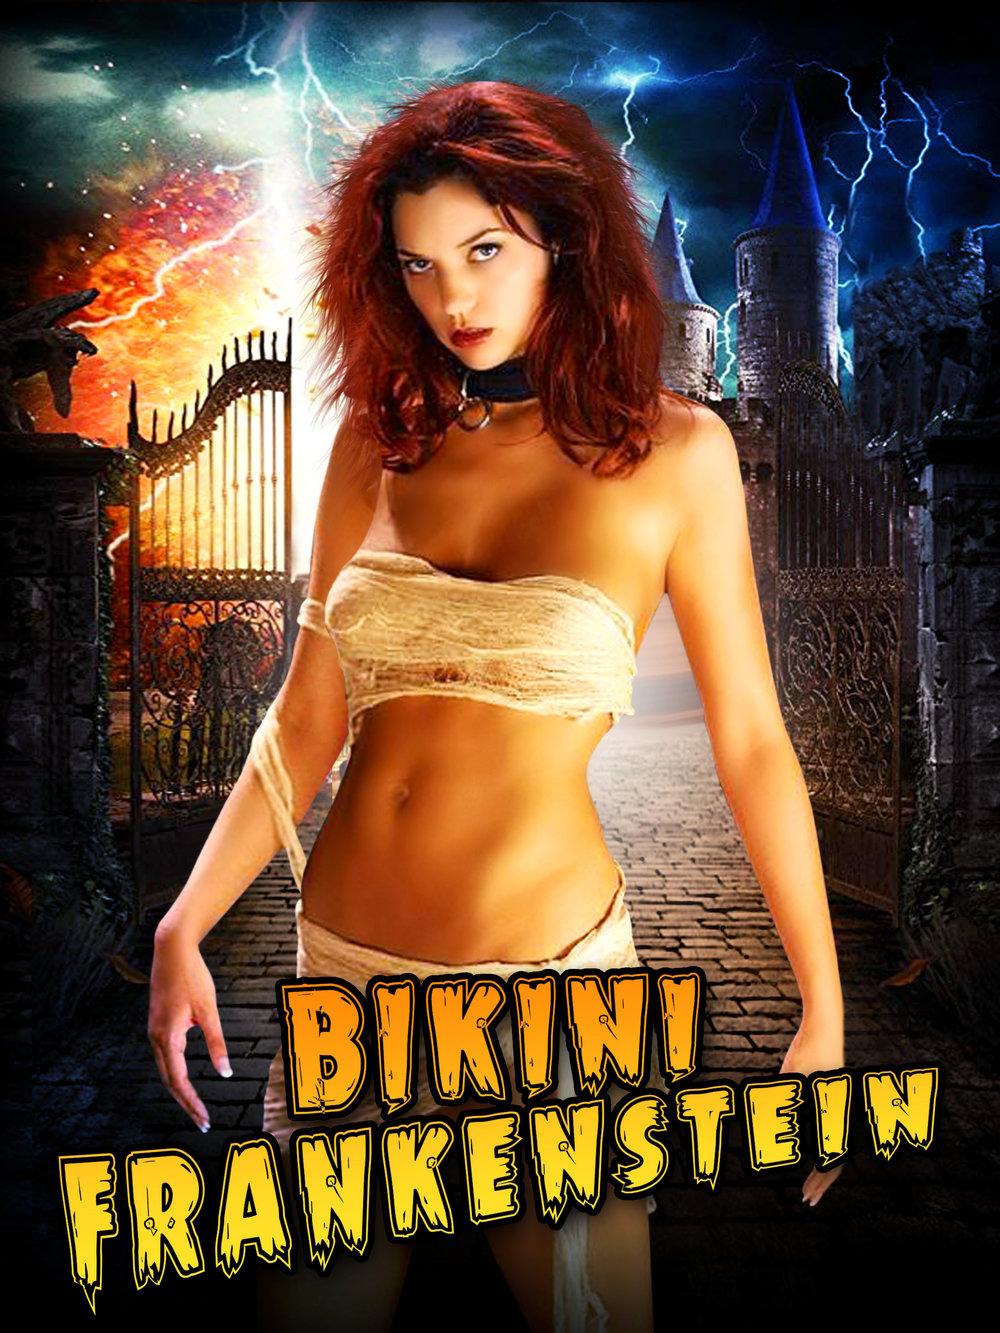 FullMoon-BikiniFrankenstein-Full-Image-en-US.jpg